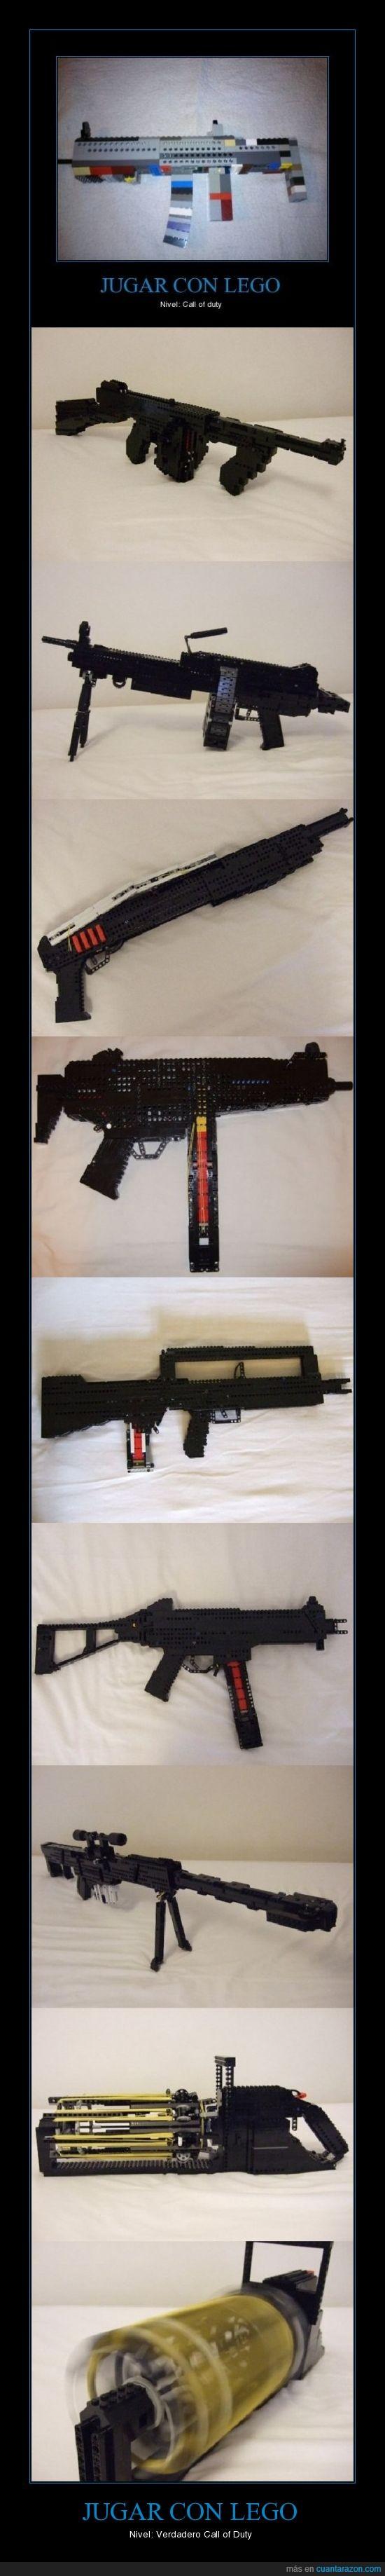 armas,de,disparan,fichas,juguetes,lego,que